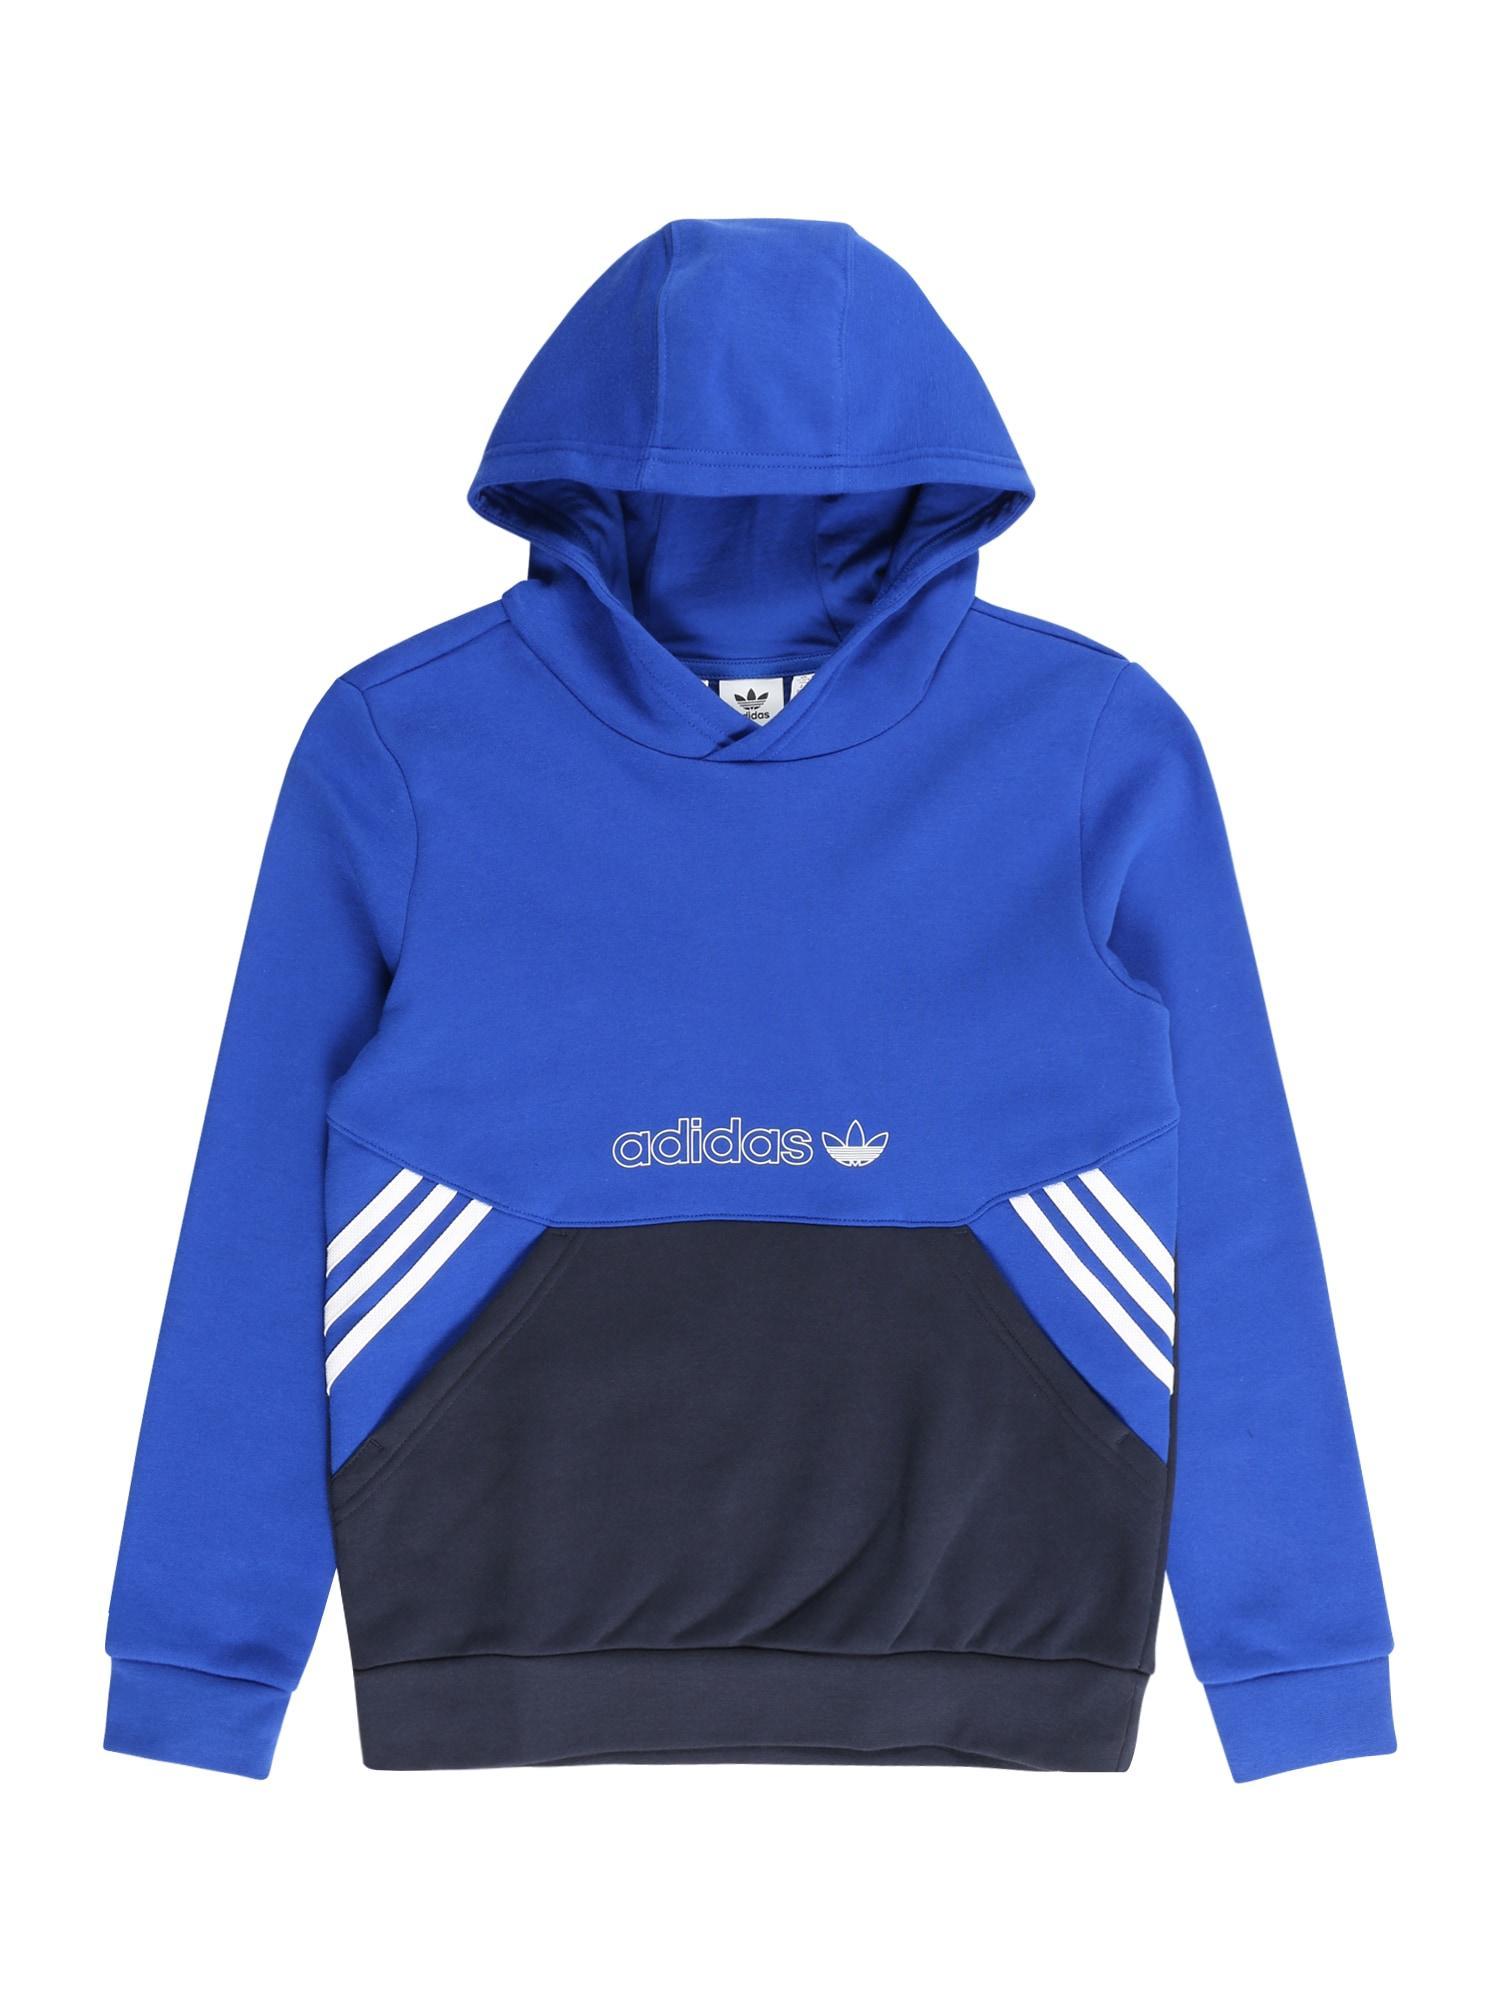 "ADIDAS ORIGINALS Megztinis be užsegimo ultramarino mėlyna (skaidri) / balta / sodri mėlyna (""karališka"")"